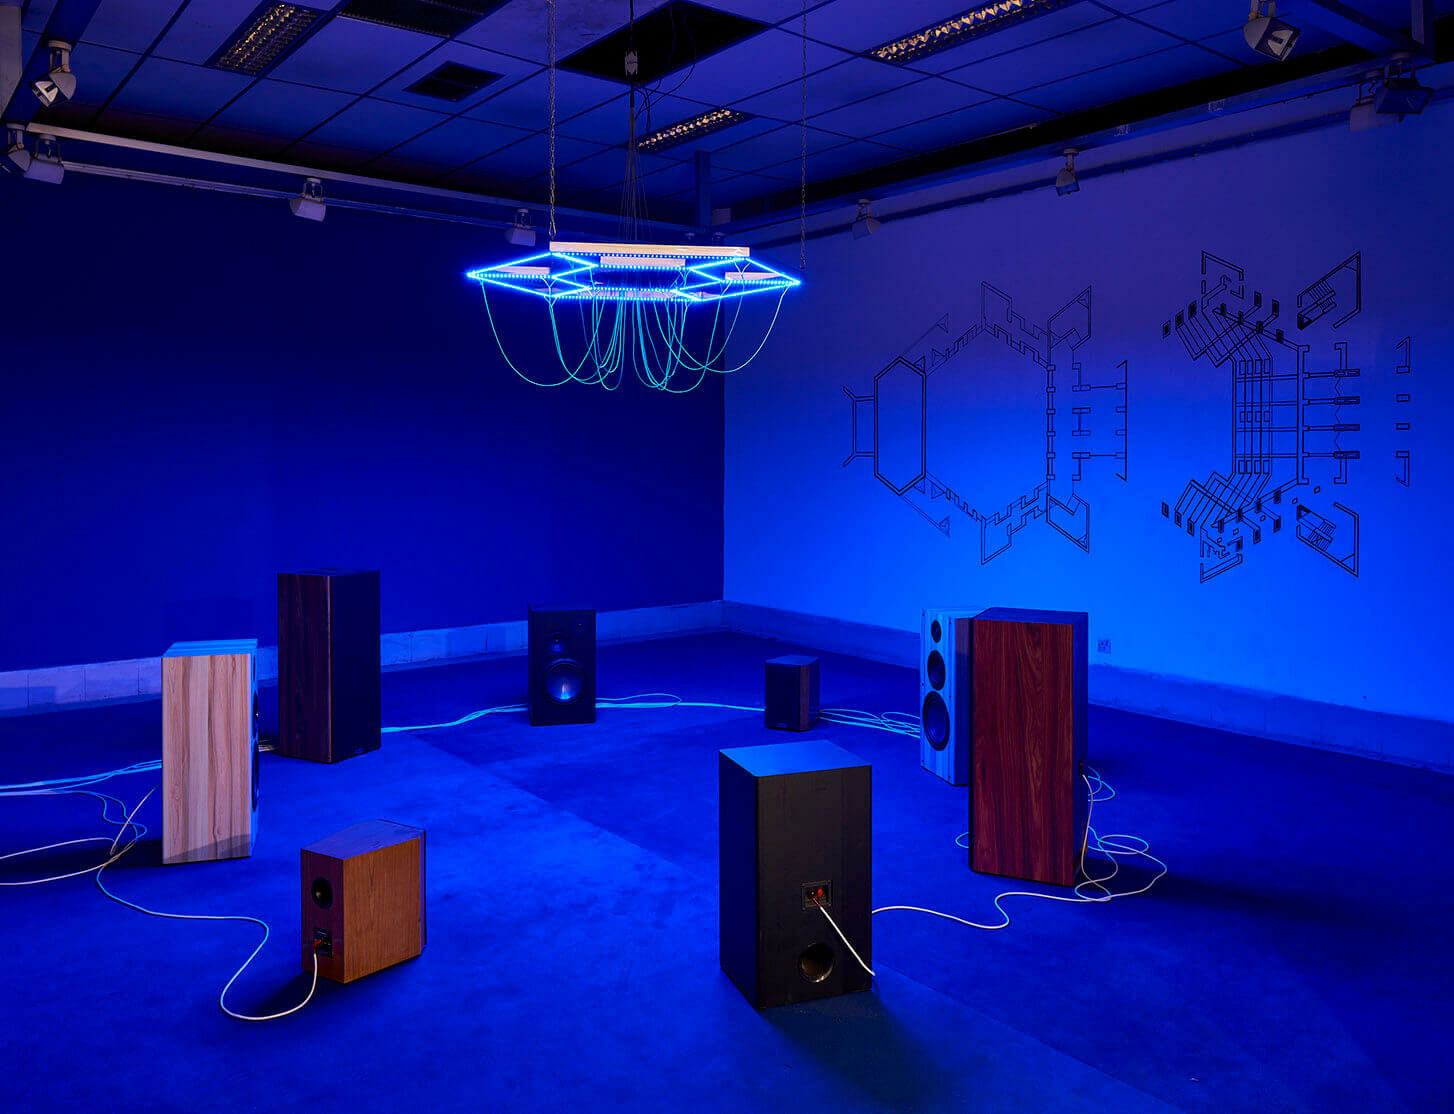 New installation by Haroon Mirza at 2020 Dhaka Art Summit